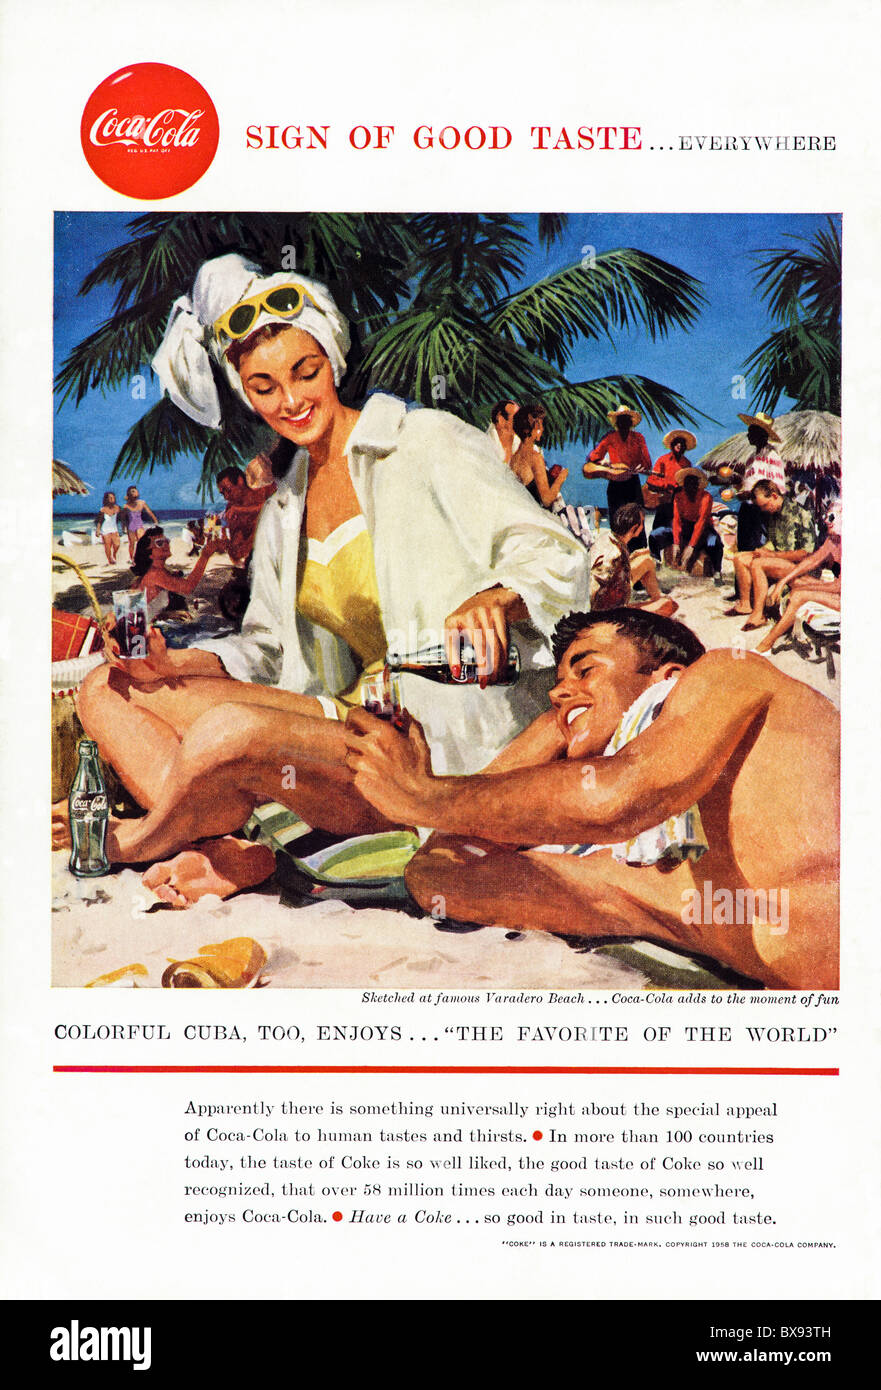 Classic Coca Cola colour advert featuring illustration of Varadero Beach Cuba in American magazine circa 1958 - Stock Image